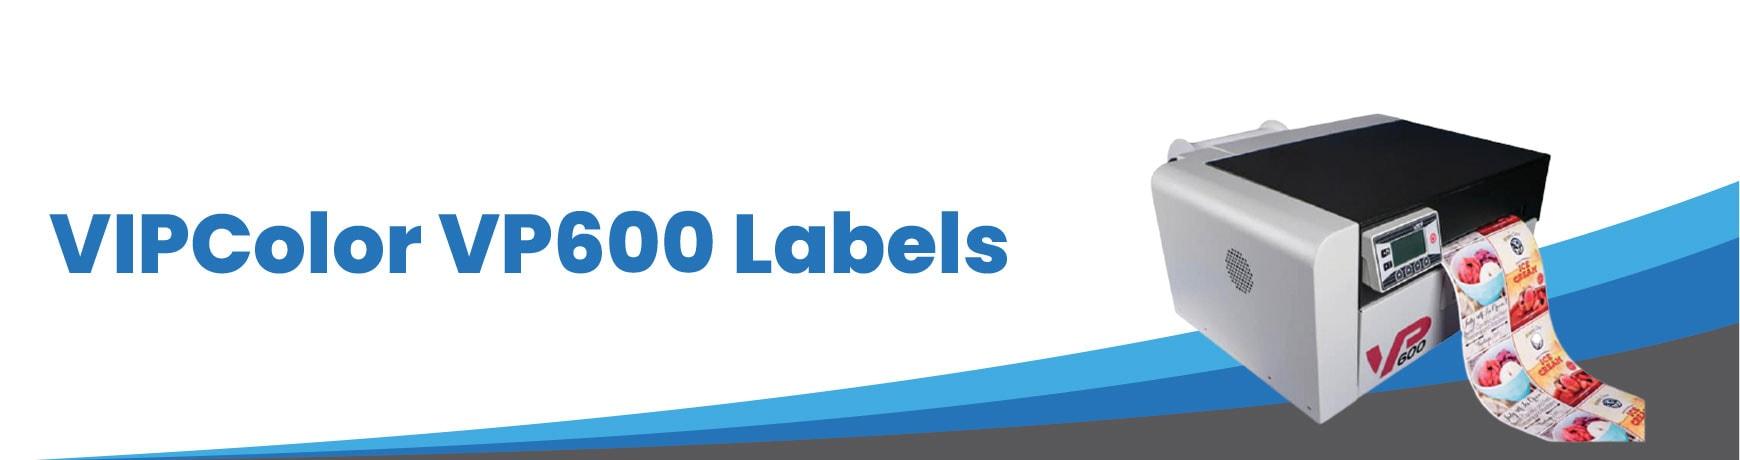 VIPColor VP600 Labels